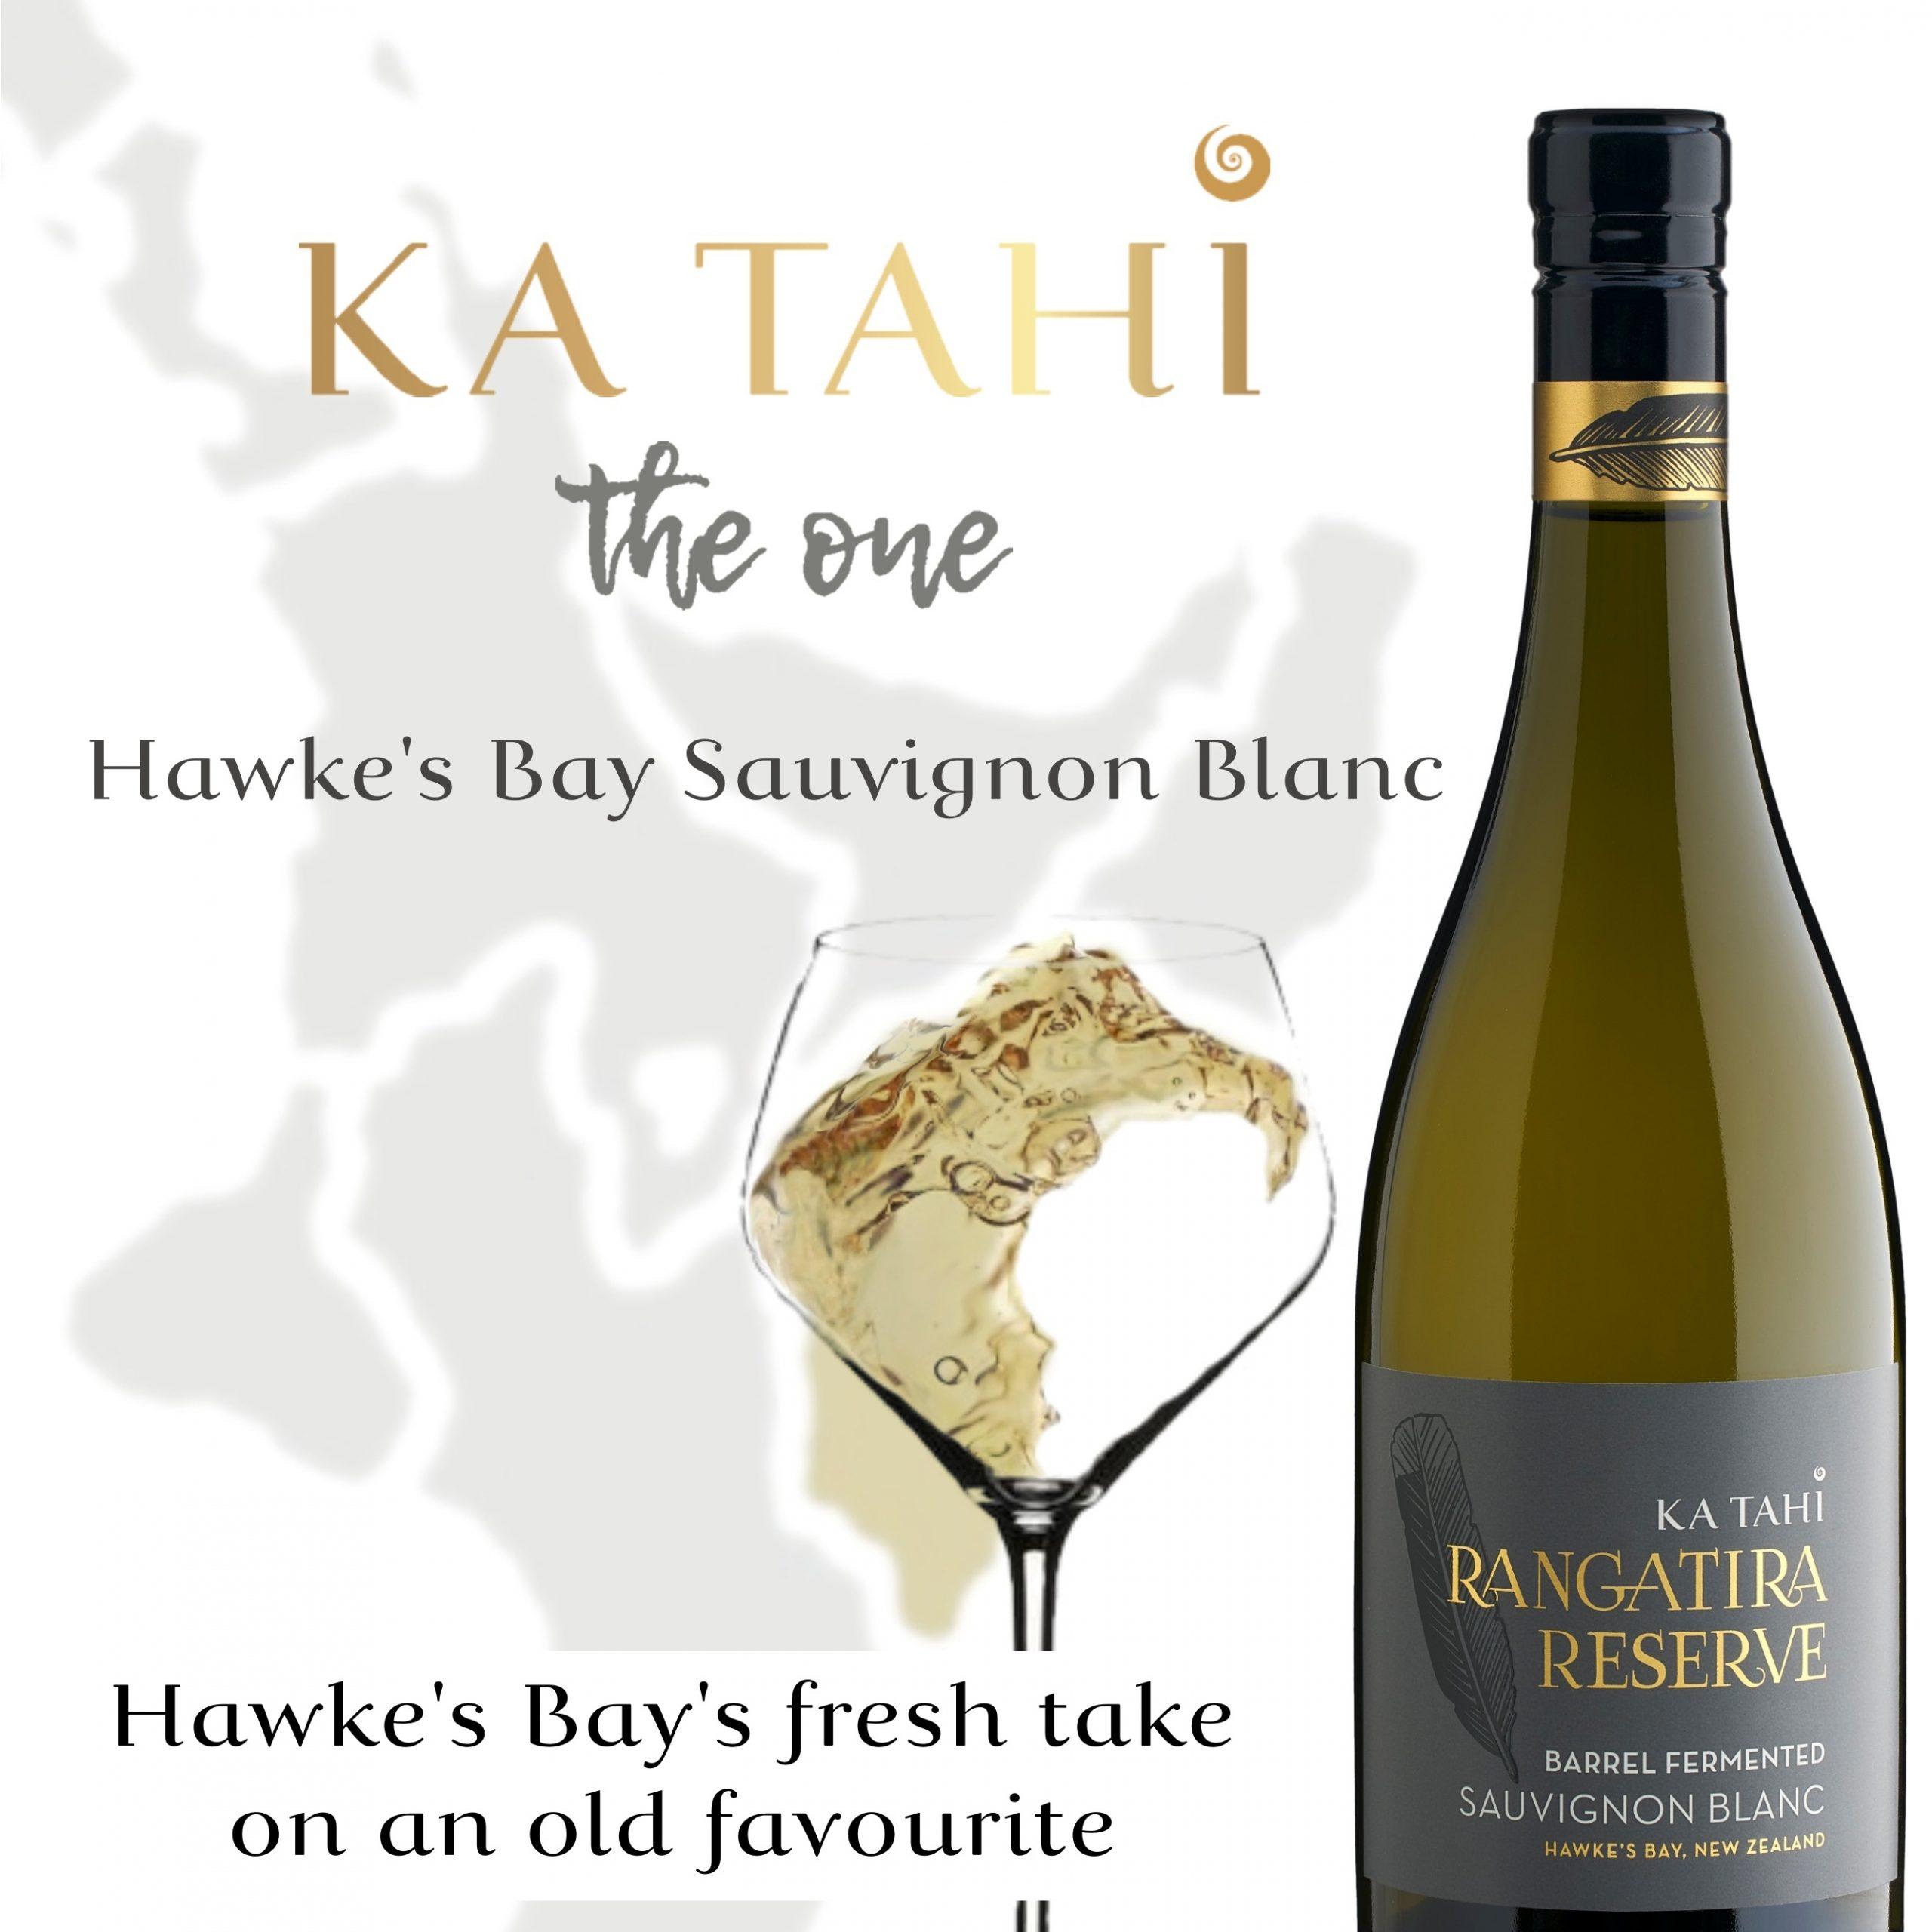 Hawke's Bay Rangatira Reserve Sauvignon Blanc